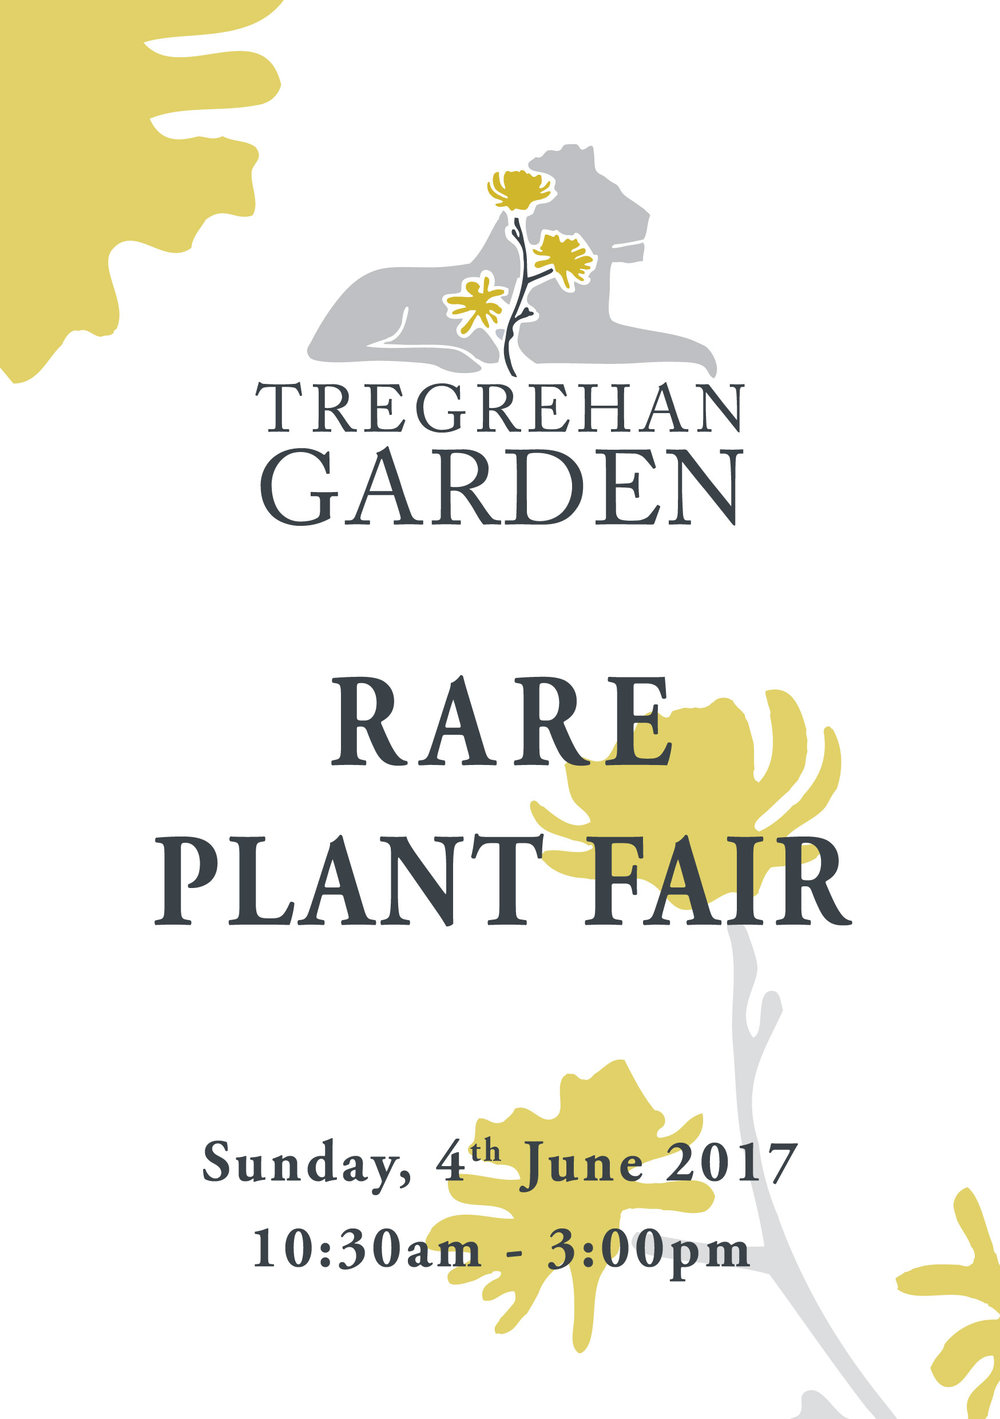 Tregrehan Plant Fair Cornwall 2017